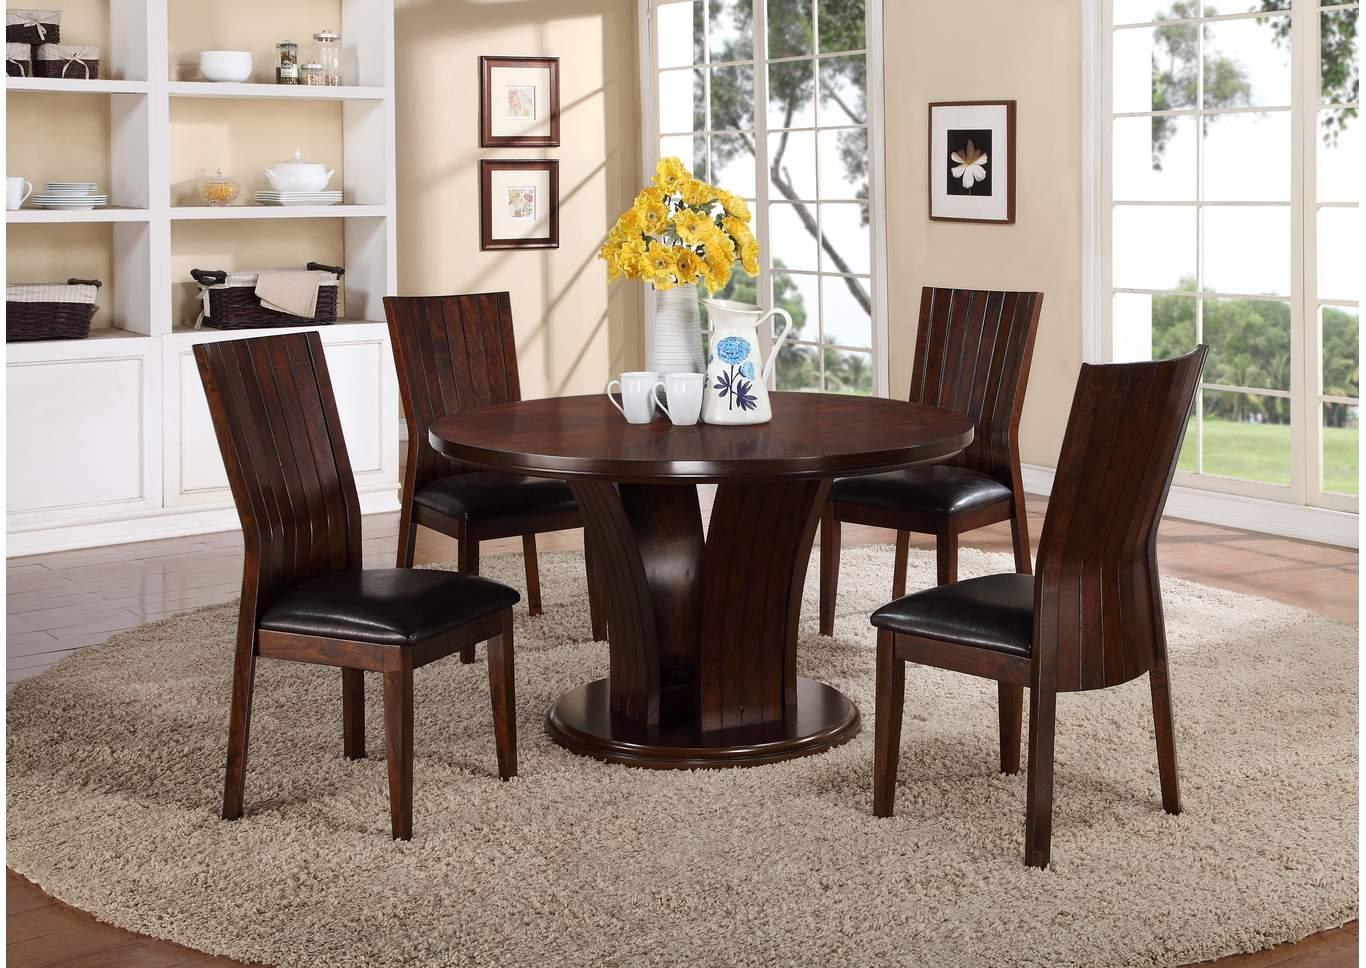 Compass furniture daria 54 espresso round dining room for Espresso dining table